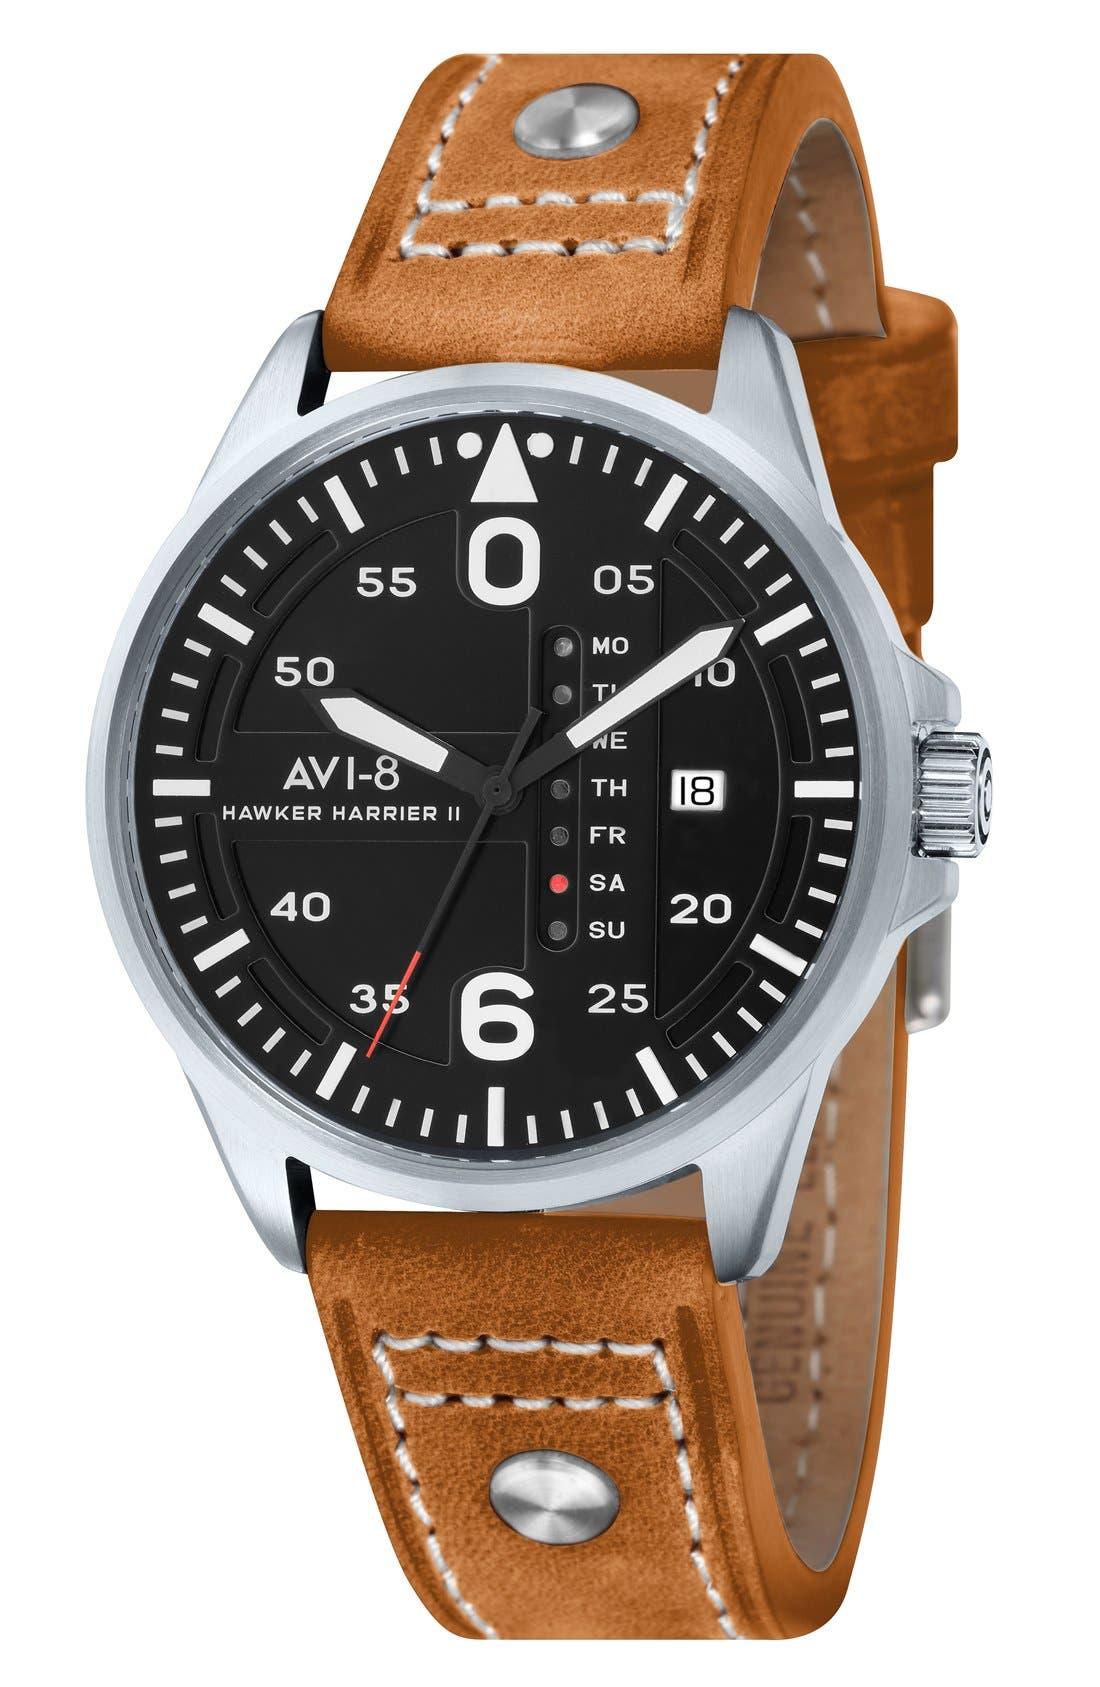 Alternate Image 1 Selected - AVI-8 'Hawker Harrier II' Leather Strap Watch, 45mm